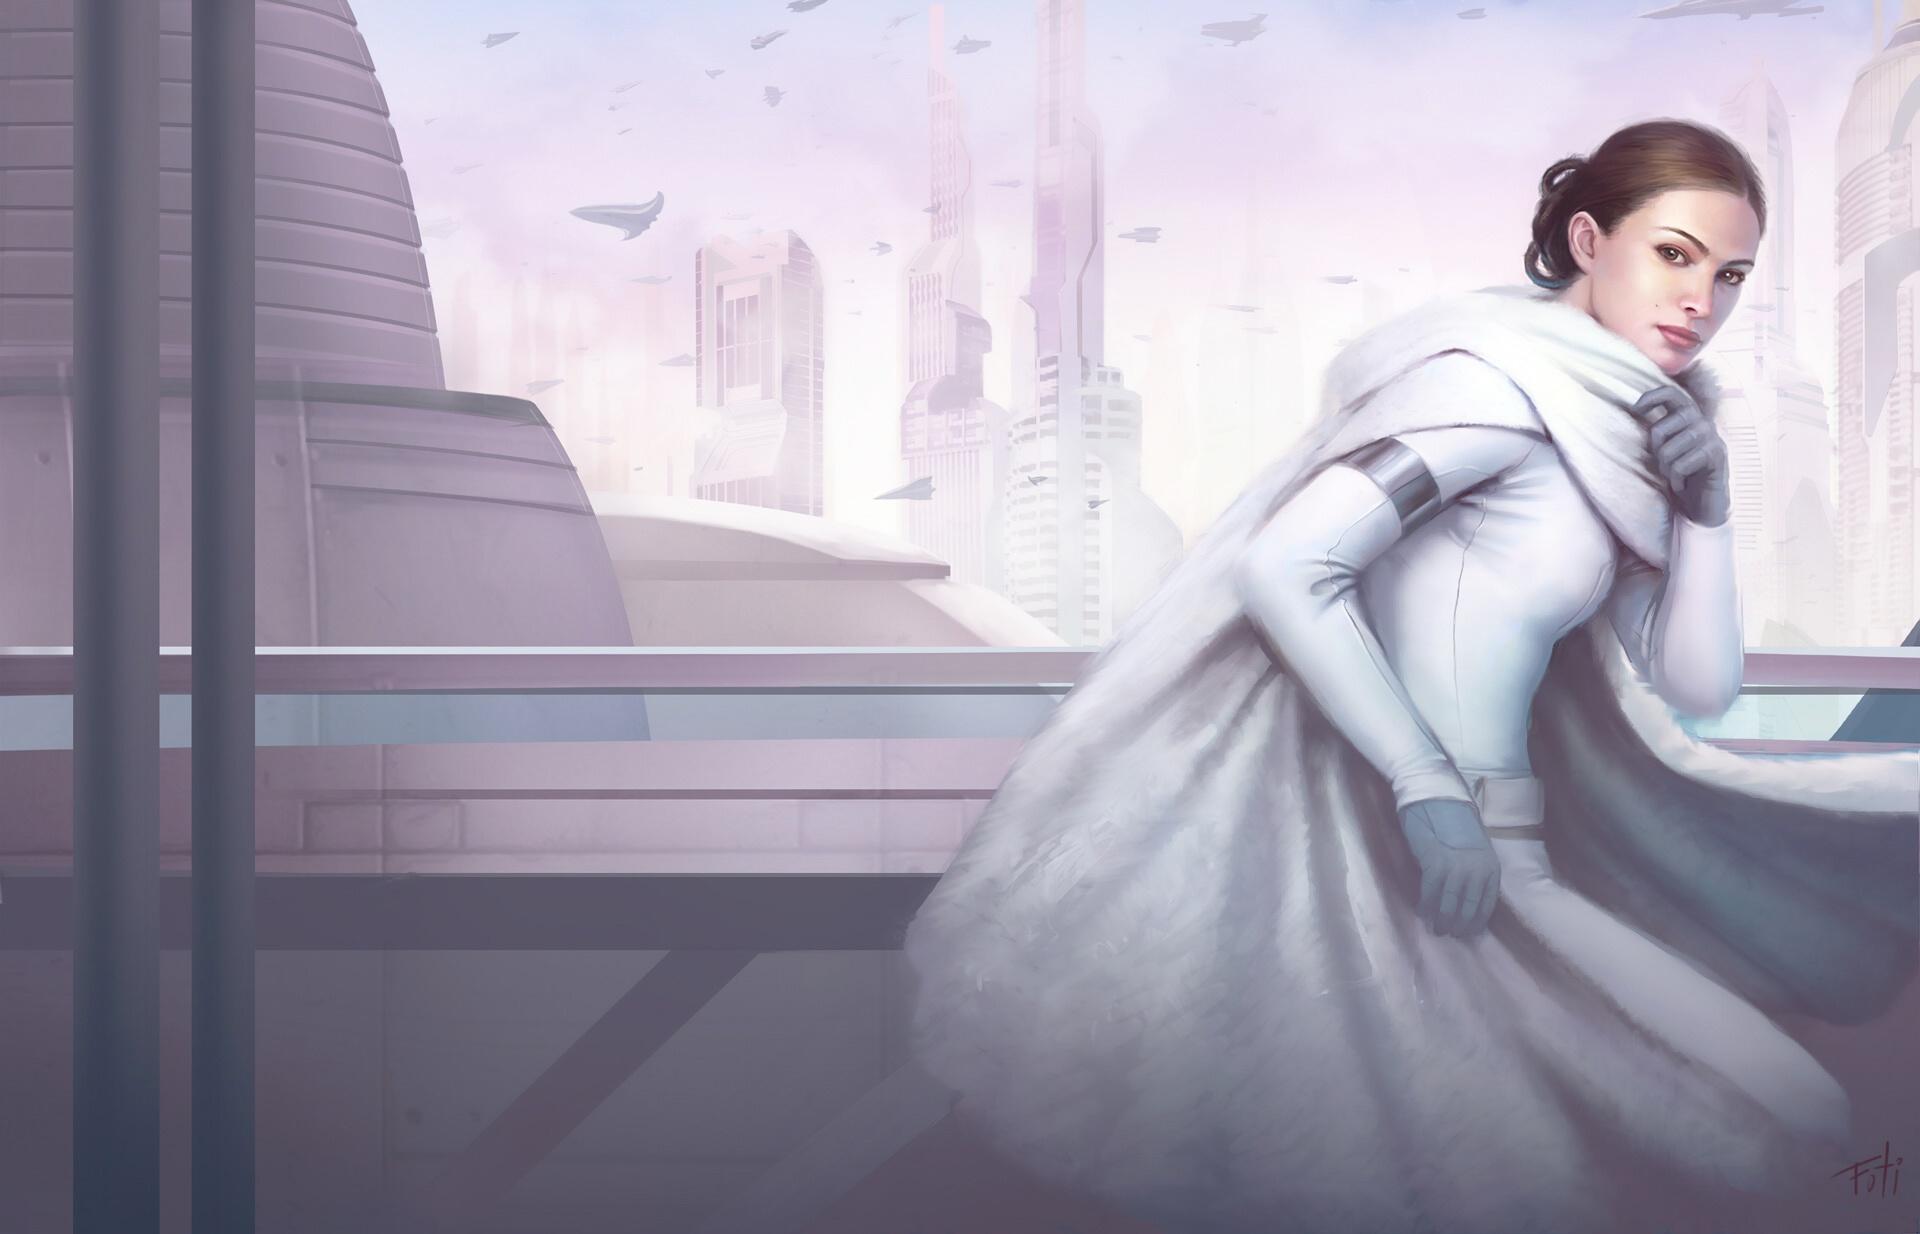 Wallpaper Artwork Natalie Portman Star Wars Padme Amidala